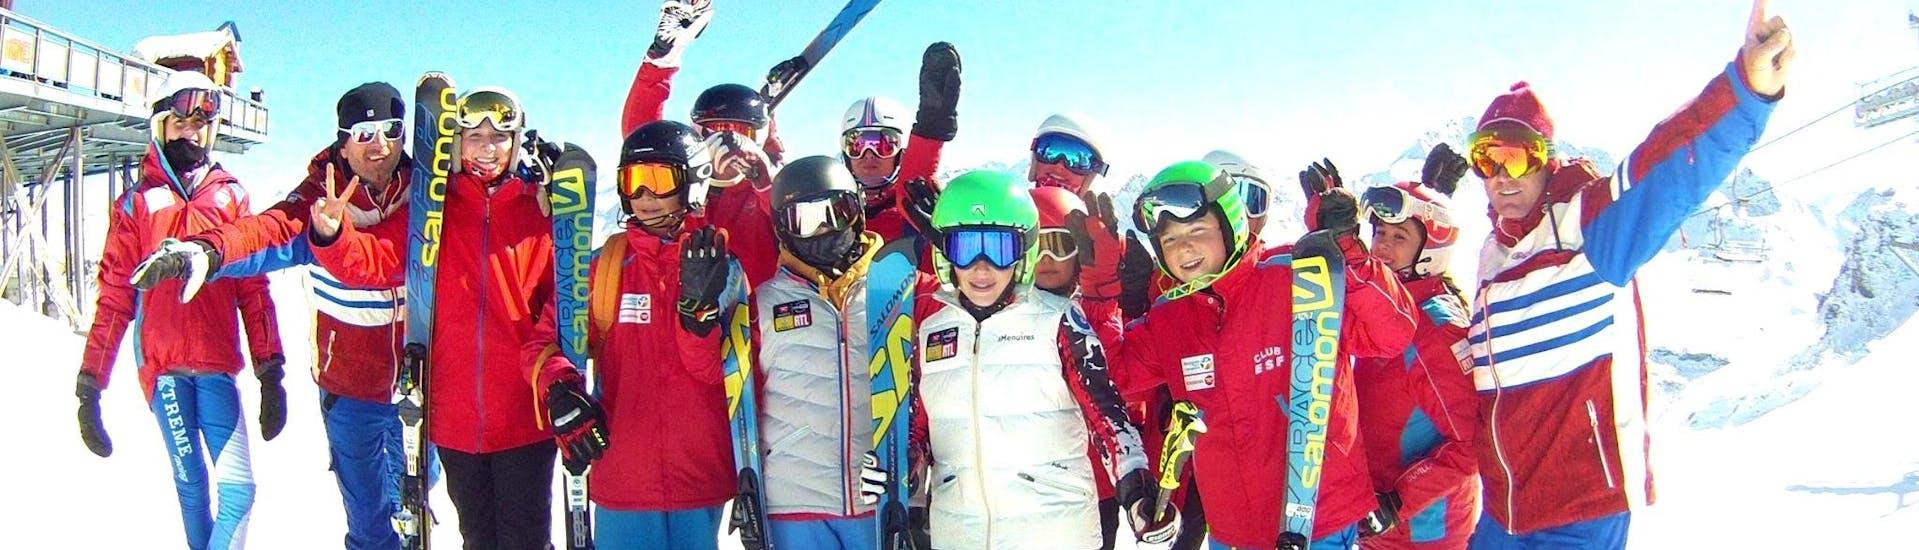 ski-lessons-for-teens-13-18-years-low-season-esf-la-plagne-hero